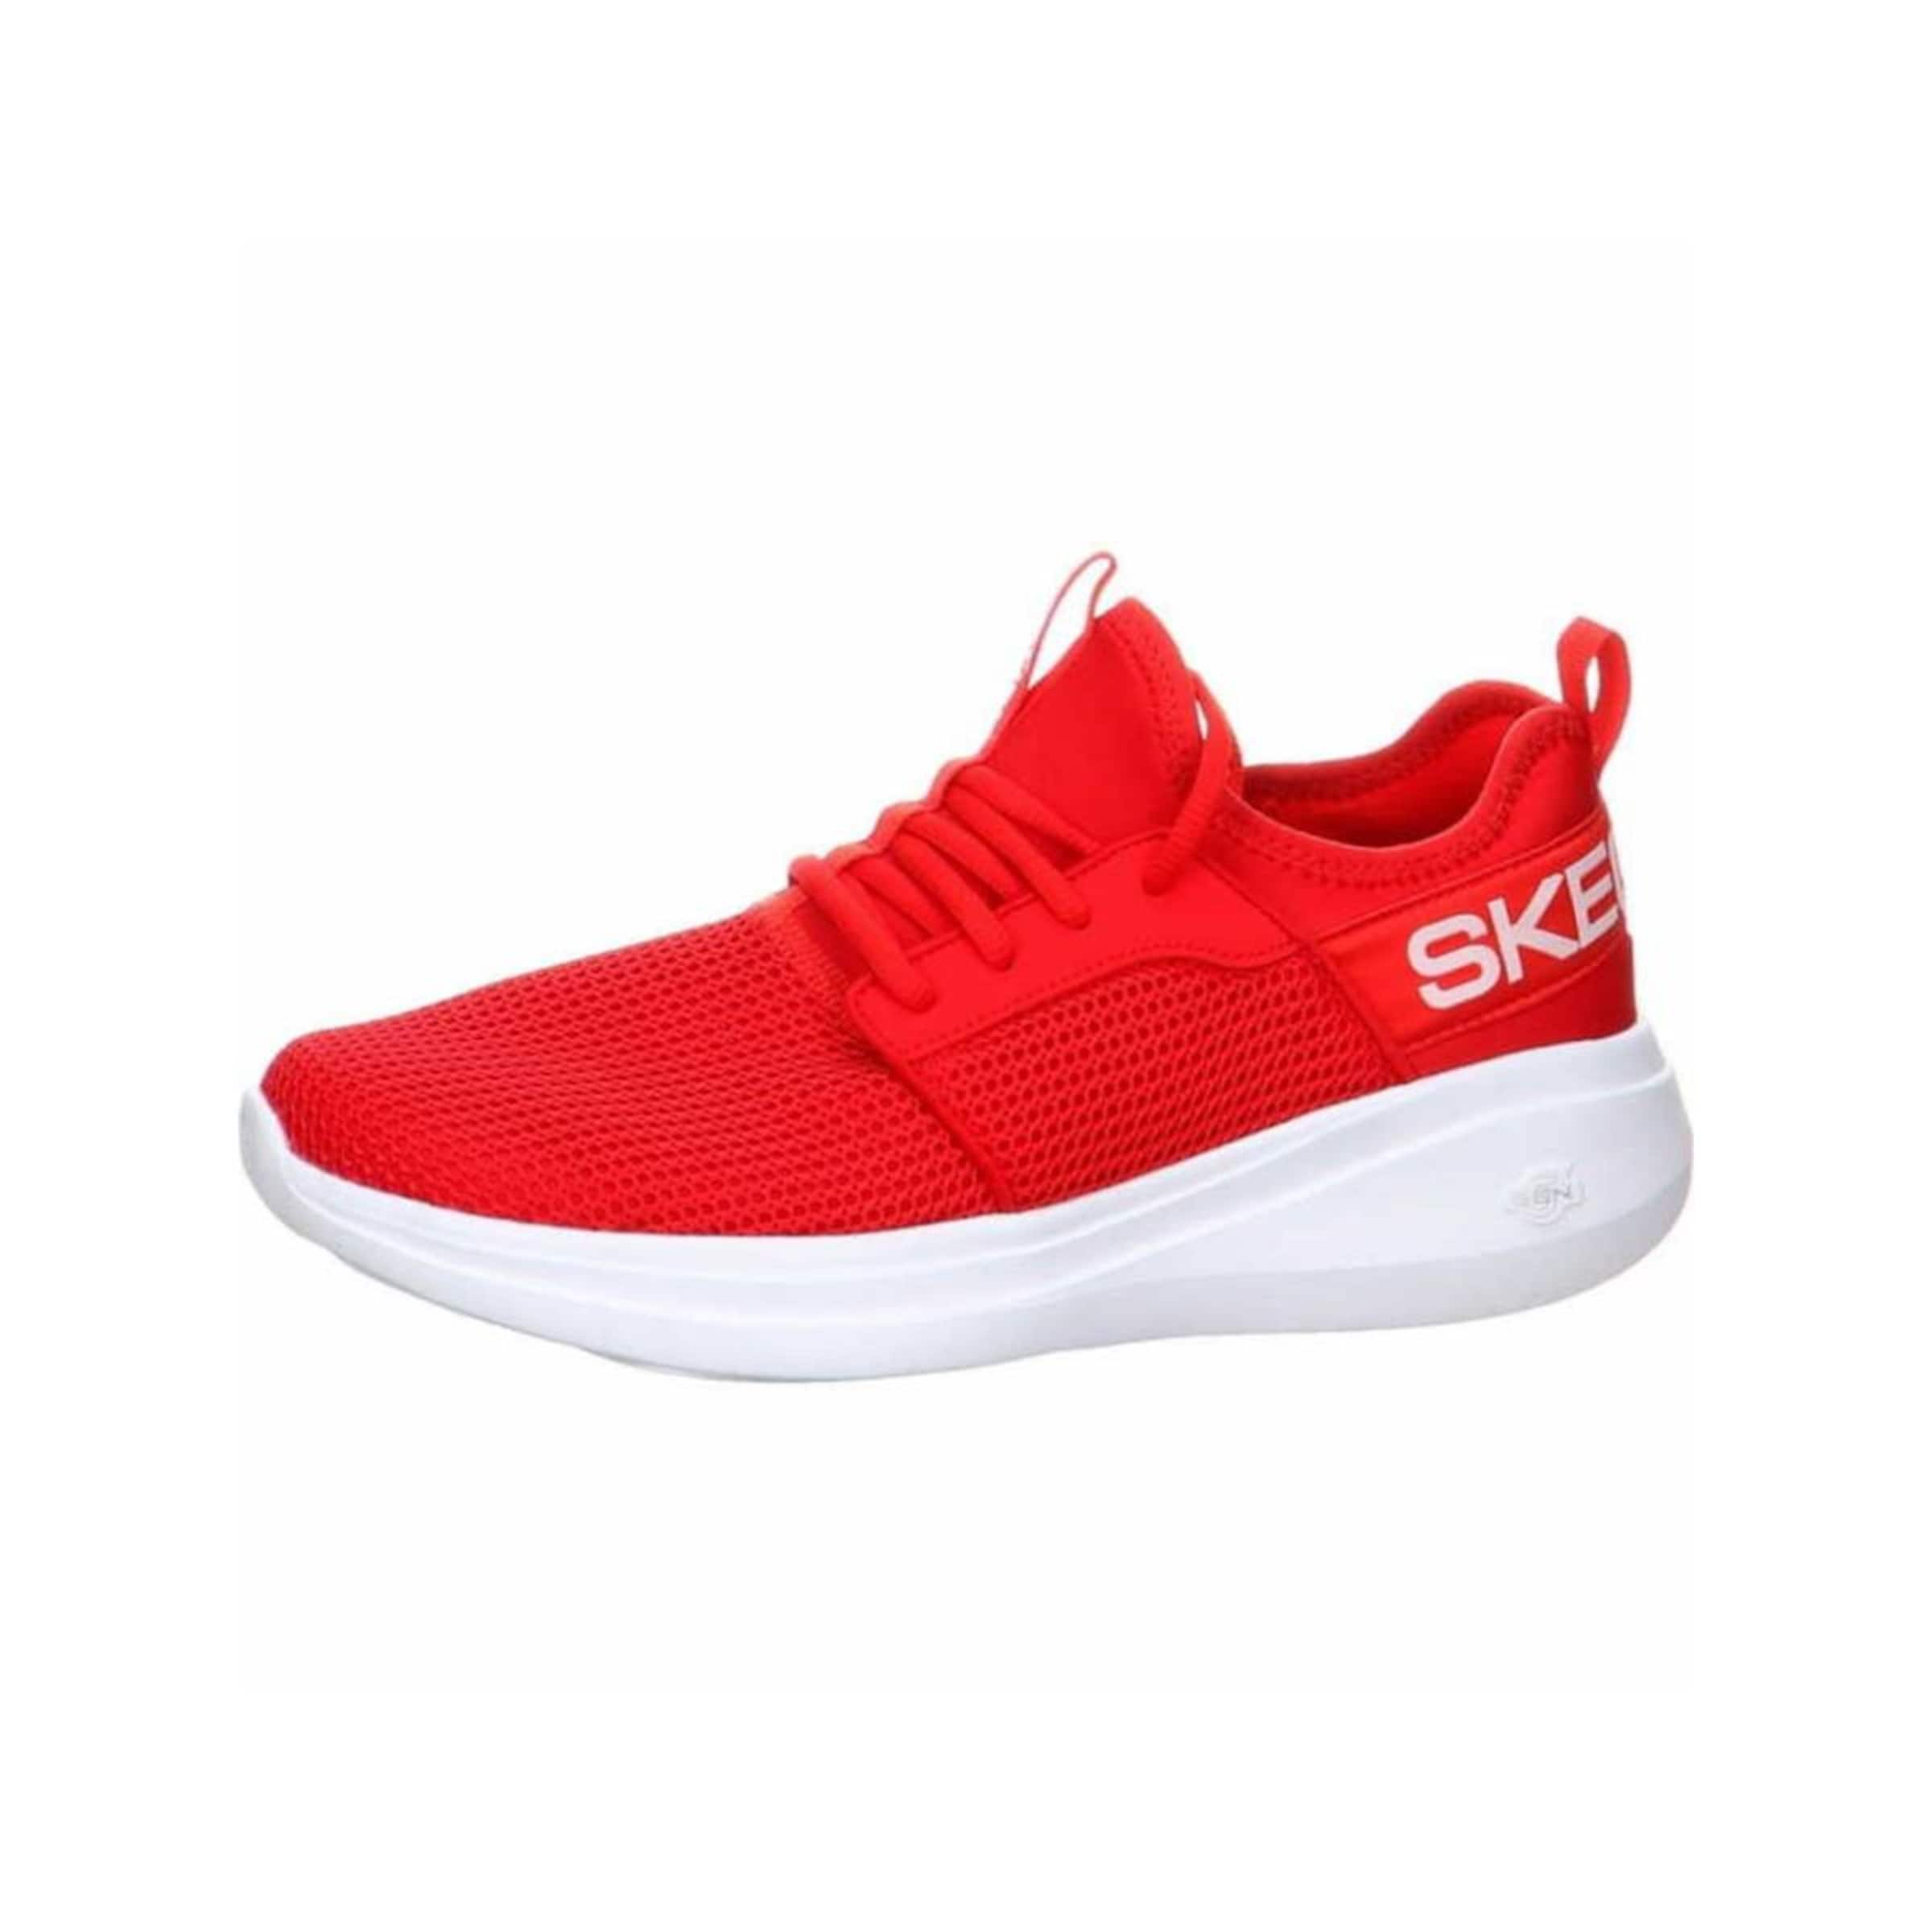 Skechers Neonrot Schnürschuhe In Neonrot Schnürschuhe Neonrot In Schnürschuhe Skechers Skechers In XiTkZOuP